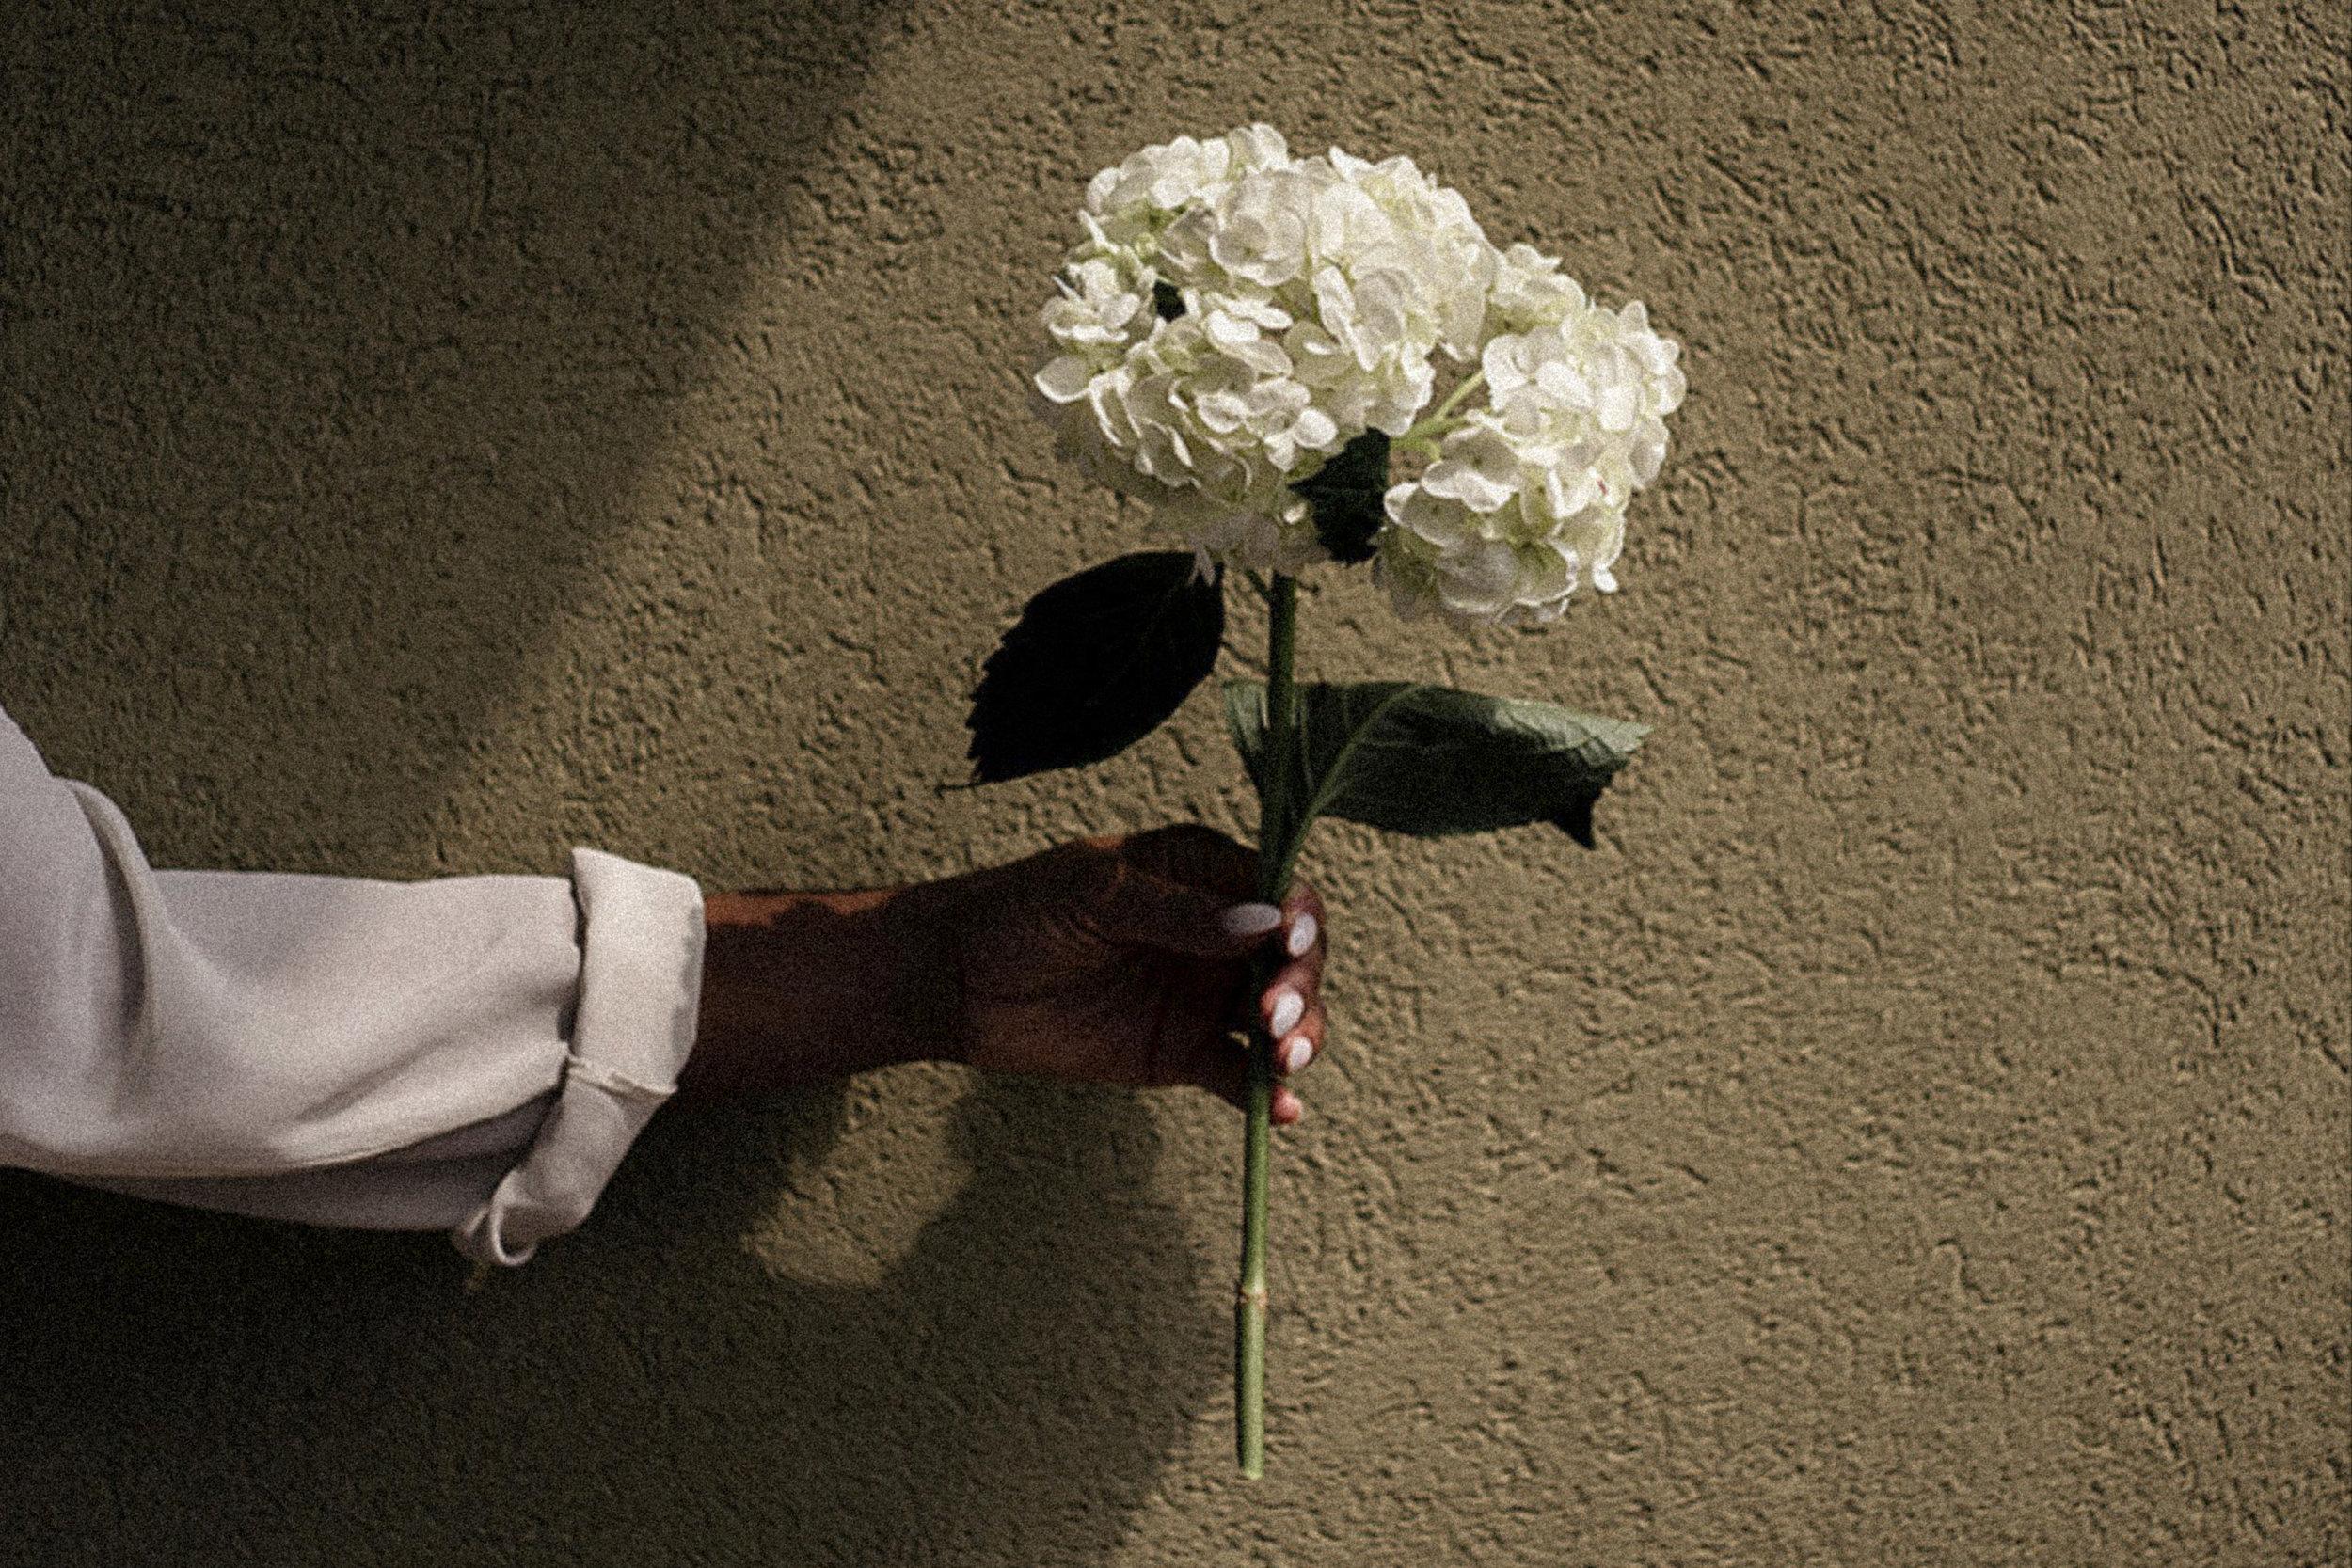 Black-woman-hand-holding-white-hydrangea-flower-by-Atlanta-photographer-Chanel-French.jpg